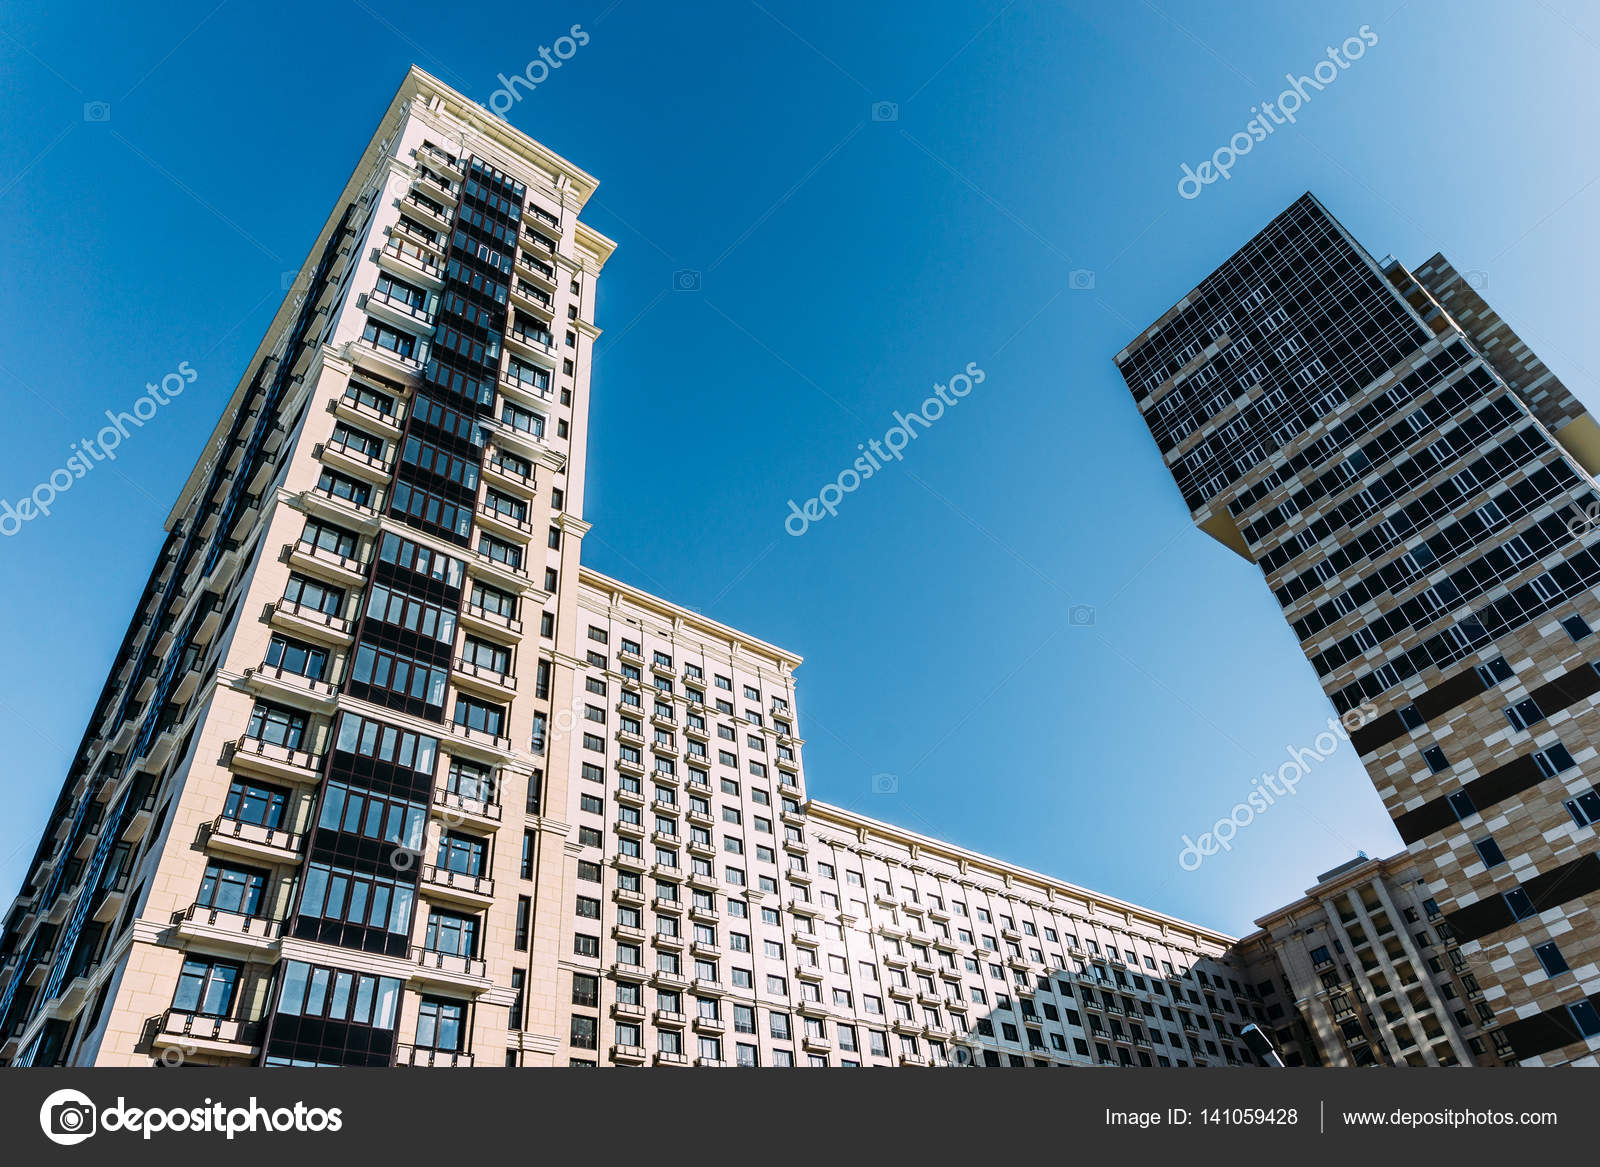 Architettura grattacieli case moderne a voronezh foto for Architettura case